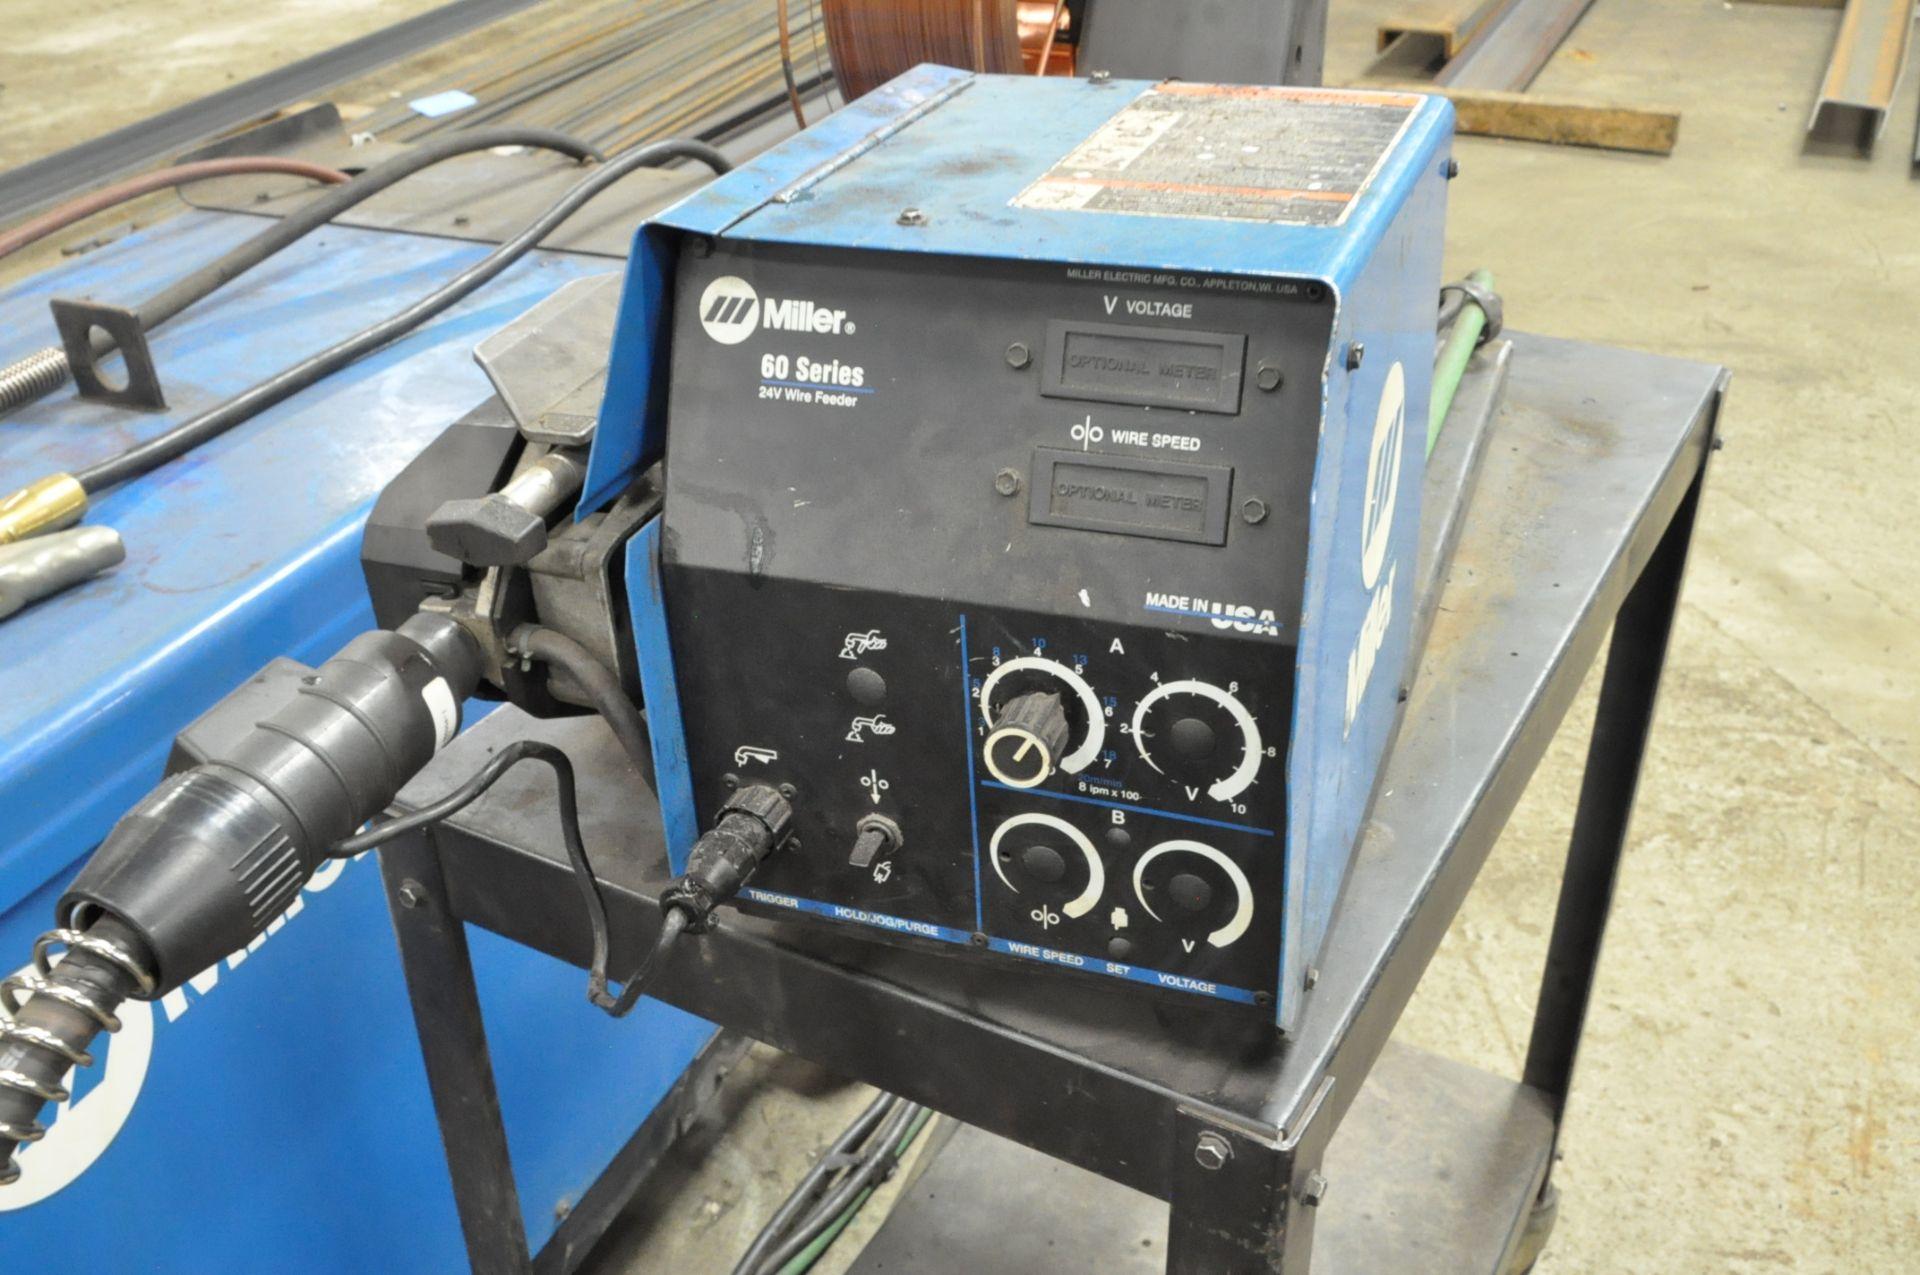 Miller Deltaweld 452, 450-Amp Capacity CV DC Arc Welding Power Source with Miller 60 Wire Feeder - Image 2 of 4